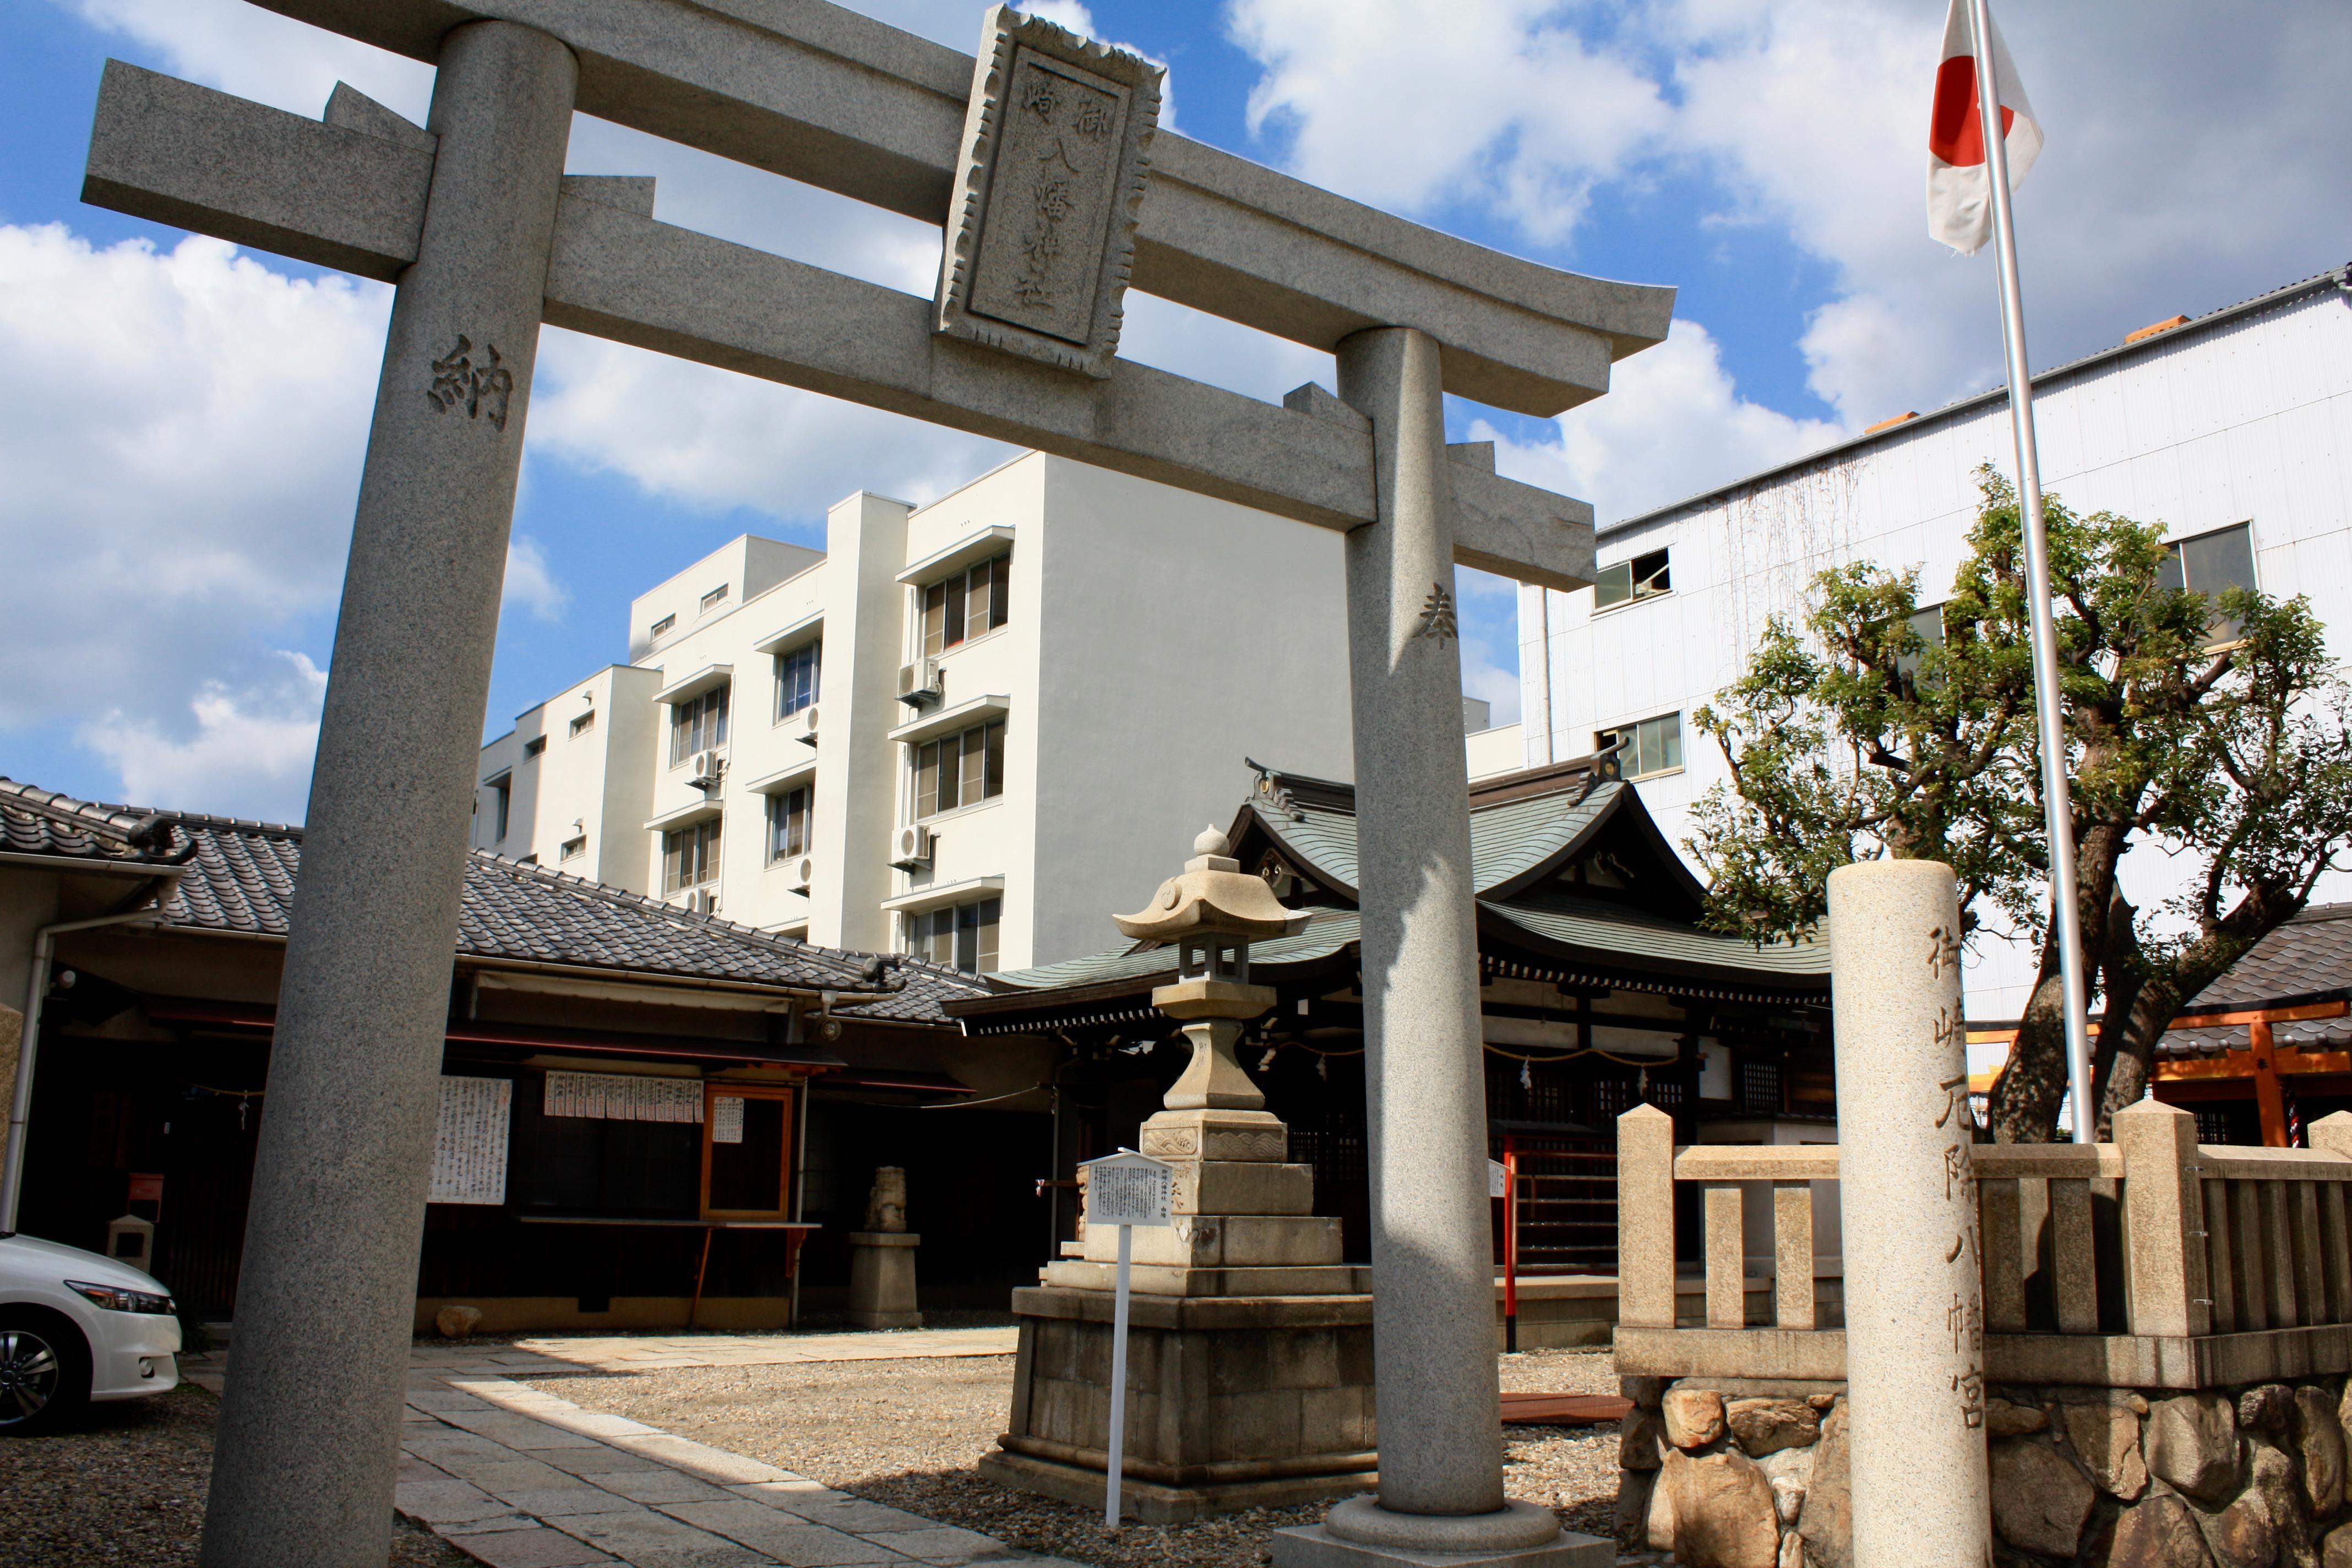 御崎八幡神社の鳥居